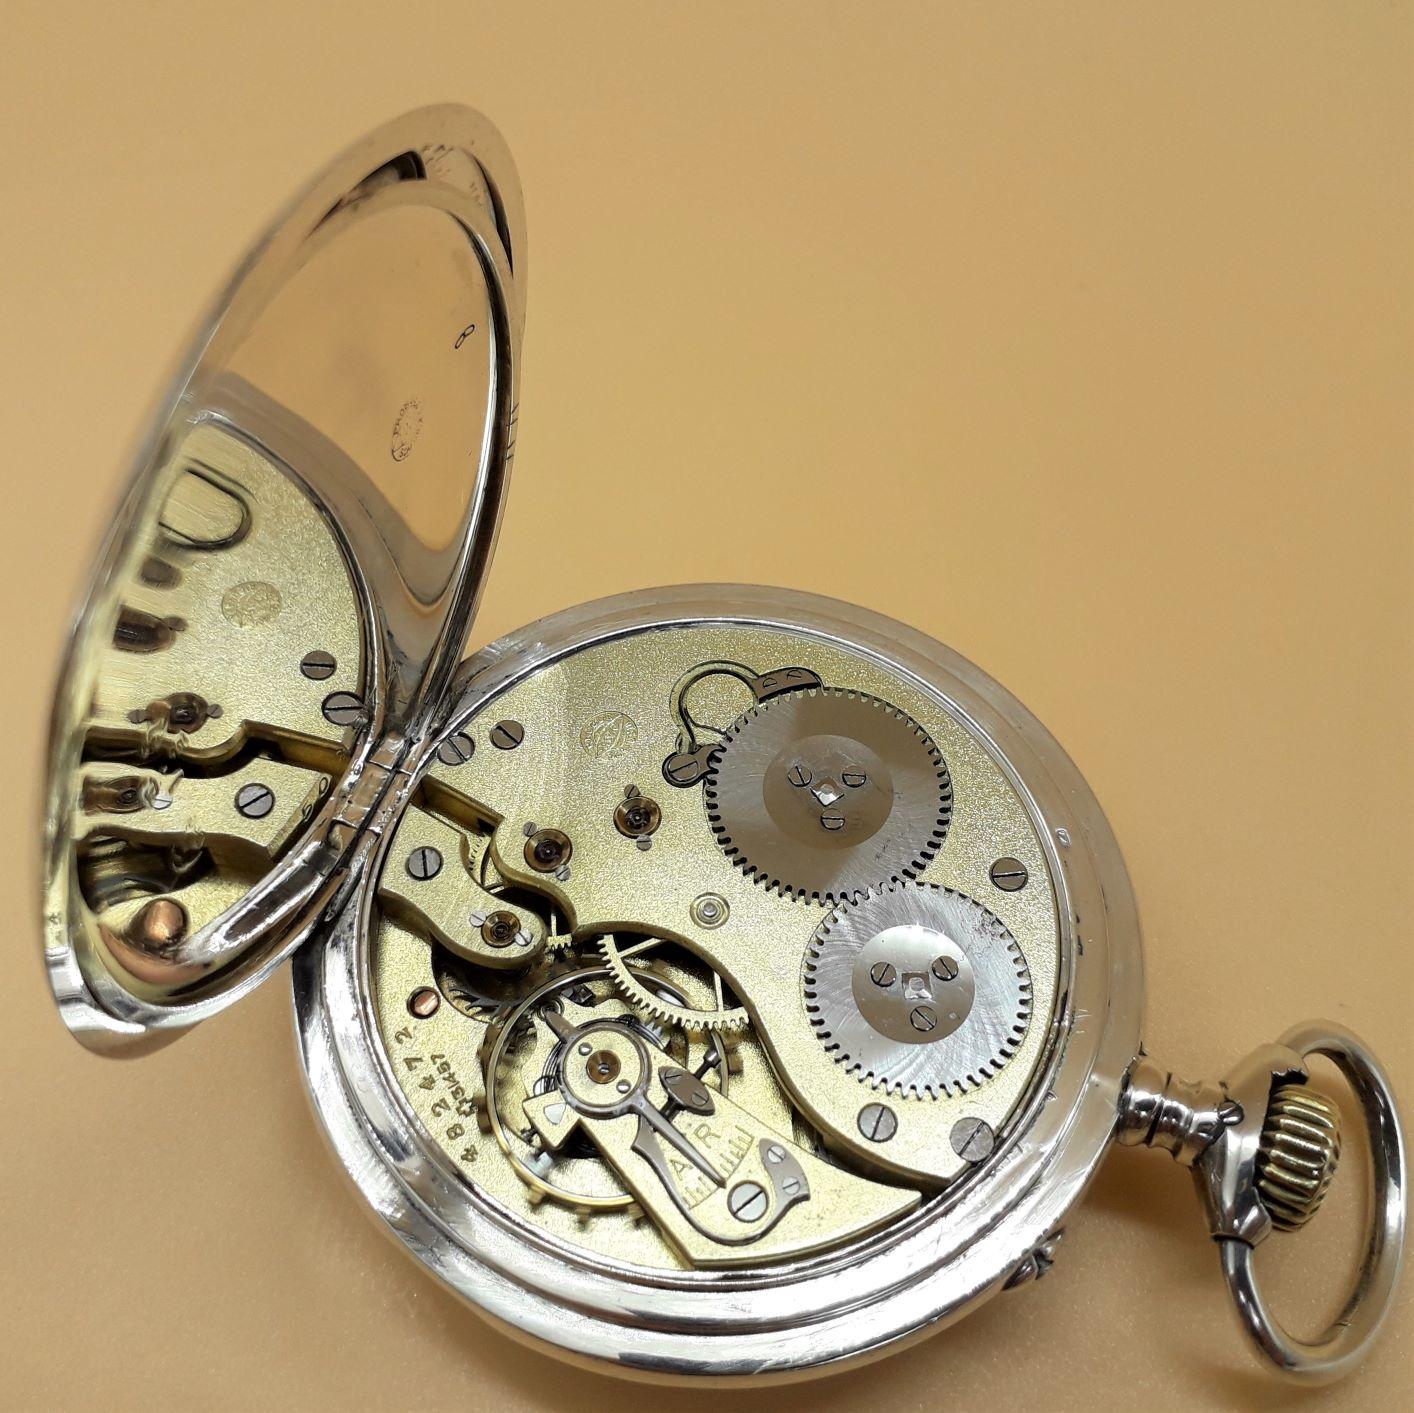 Swiss Pocket Watch by International Watch Co, IWC Rauschenbach